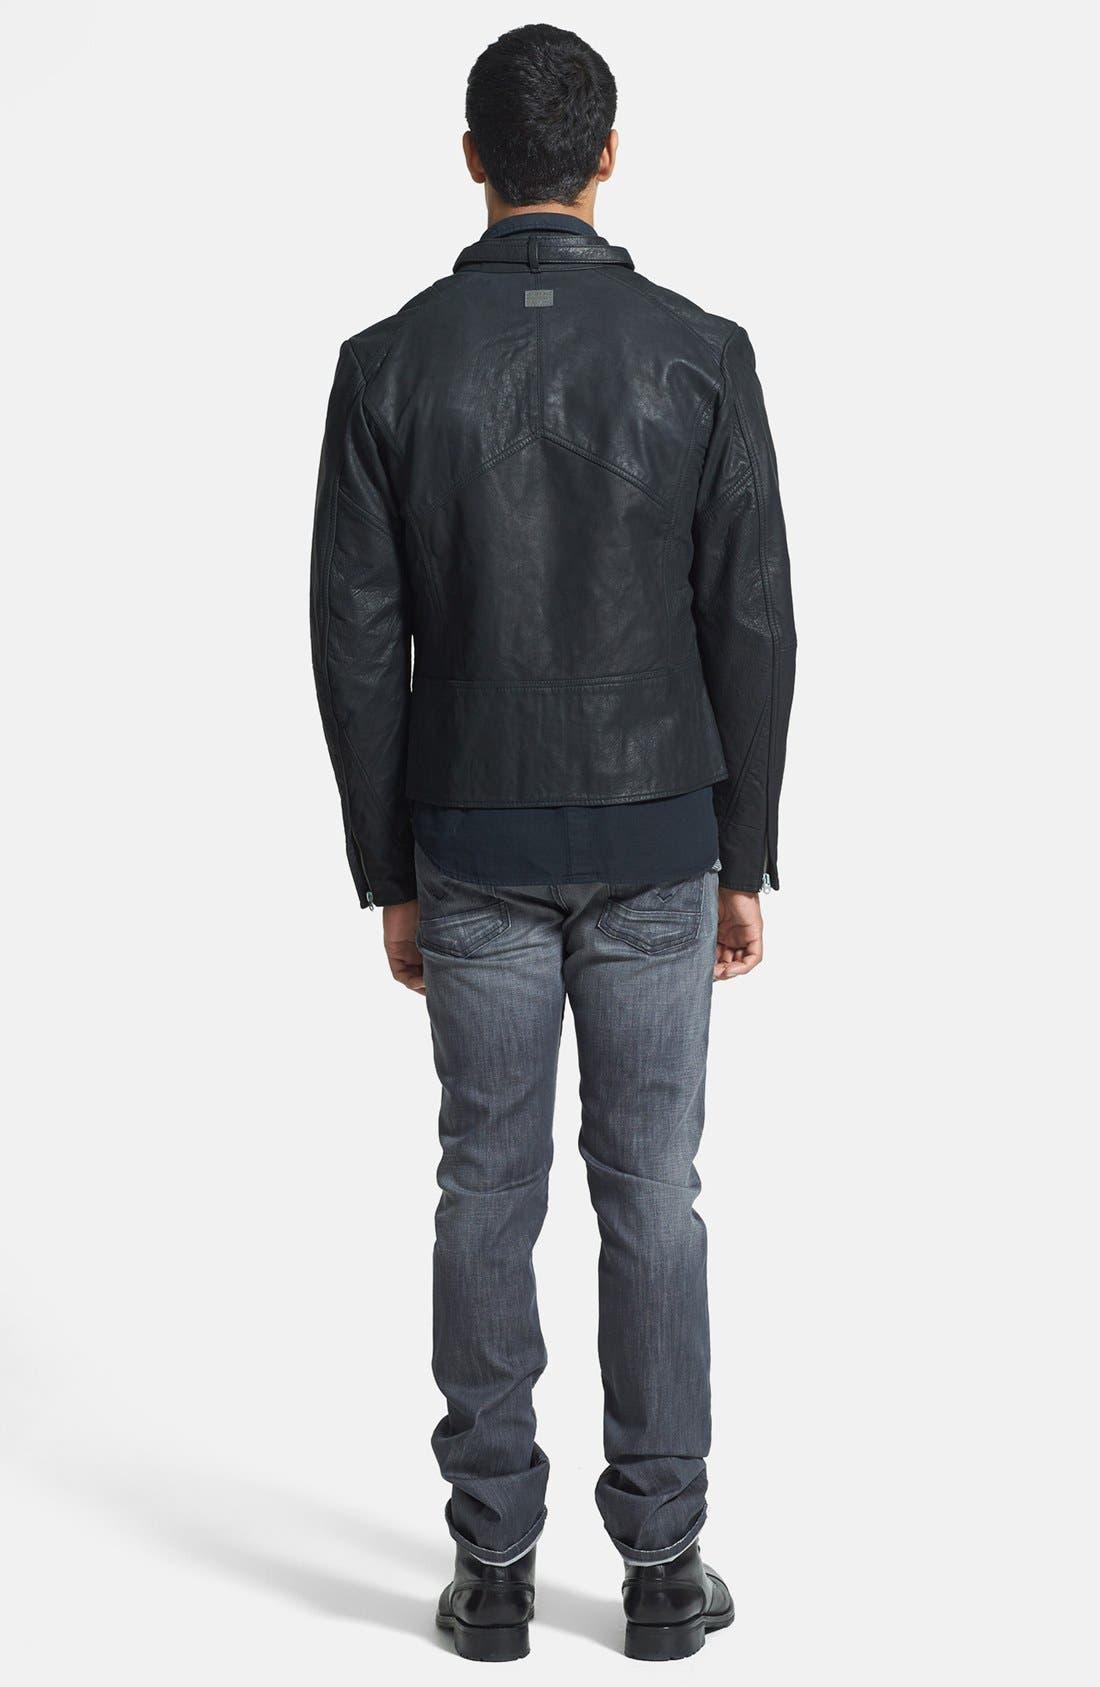 VOLCOM,                             'Upgrade' Slim Fit Long Sleeve Thermal Shirt,                             Alternate thumbnail 3, color,                             020